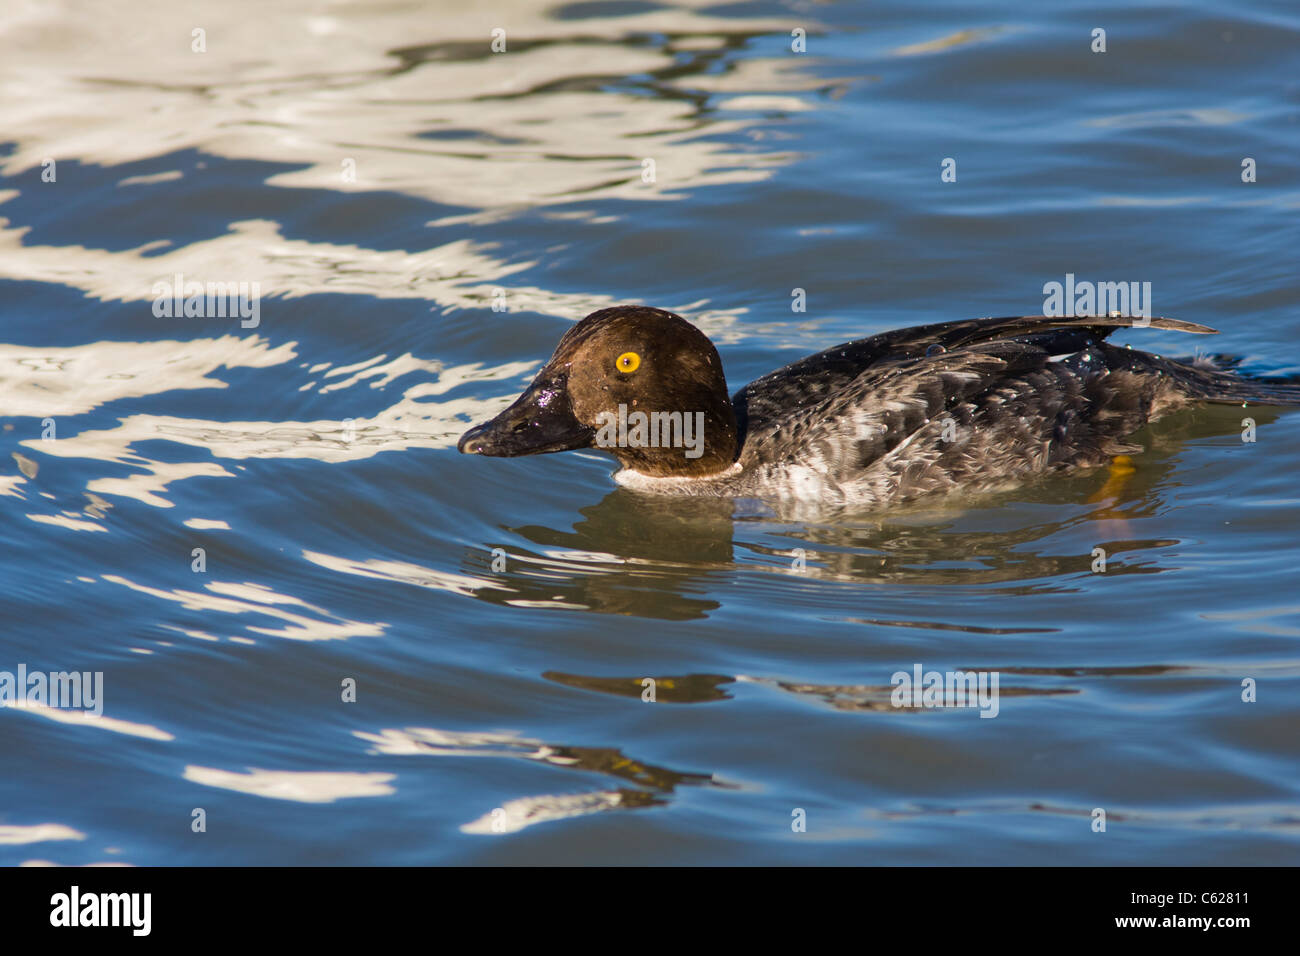 Female Common Goldeneye duck, Bucephala clangula, swimming in Gulf ocean waters at Rockport, Texas. - Stock Image